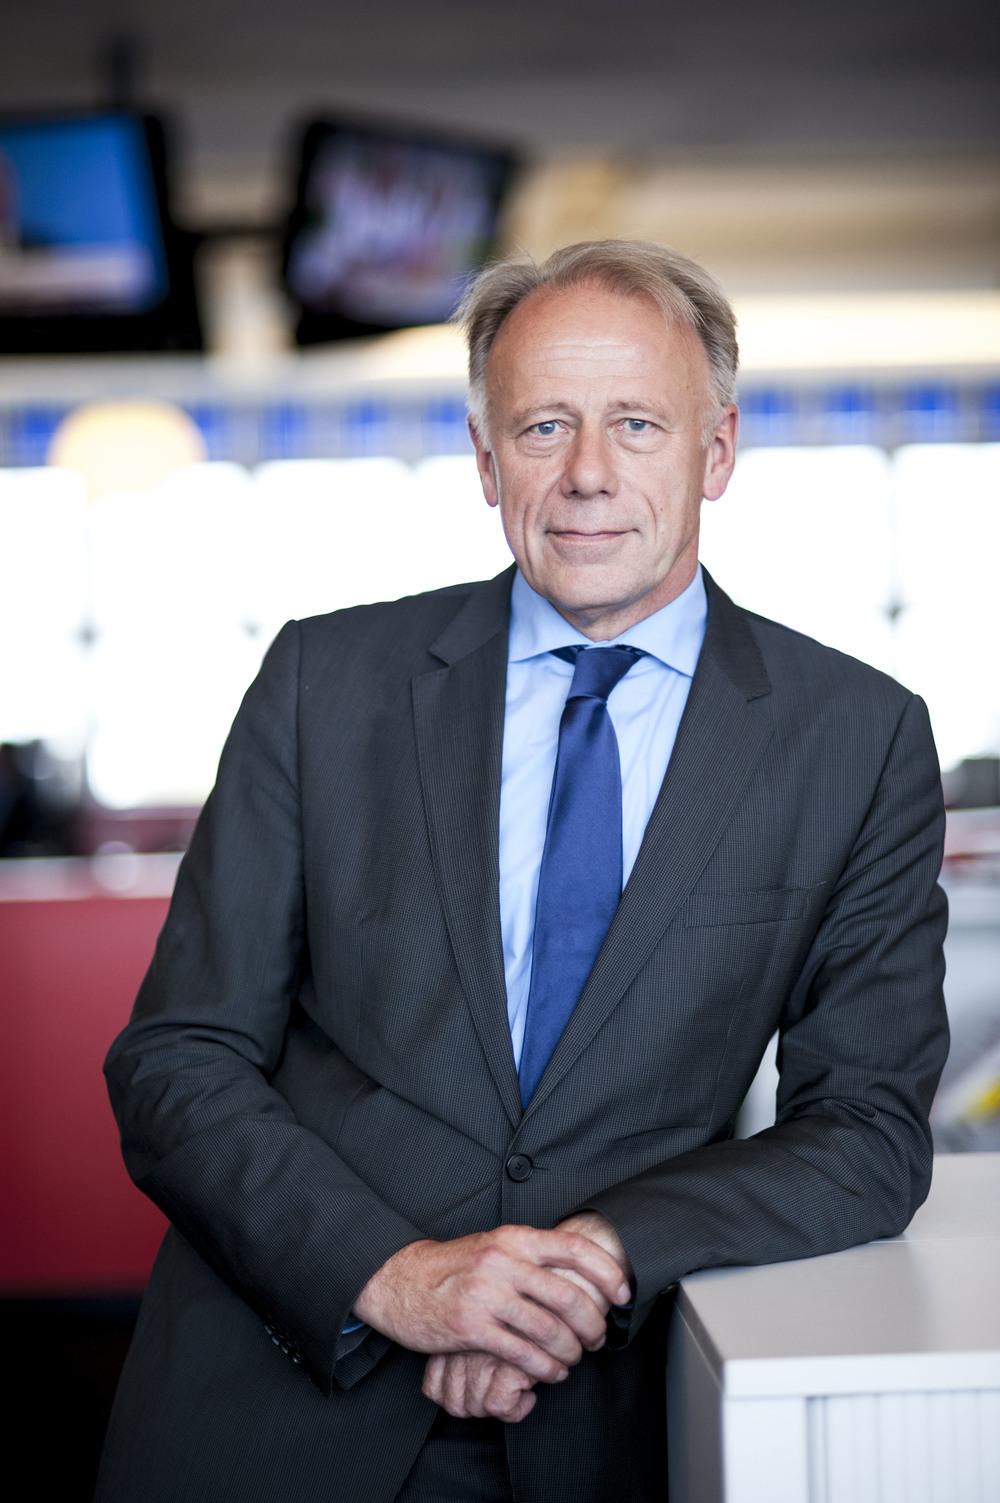 Jürgen Trittin - Bündnis 90/ Die Grünen